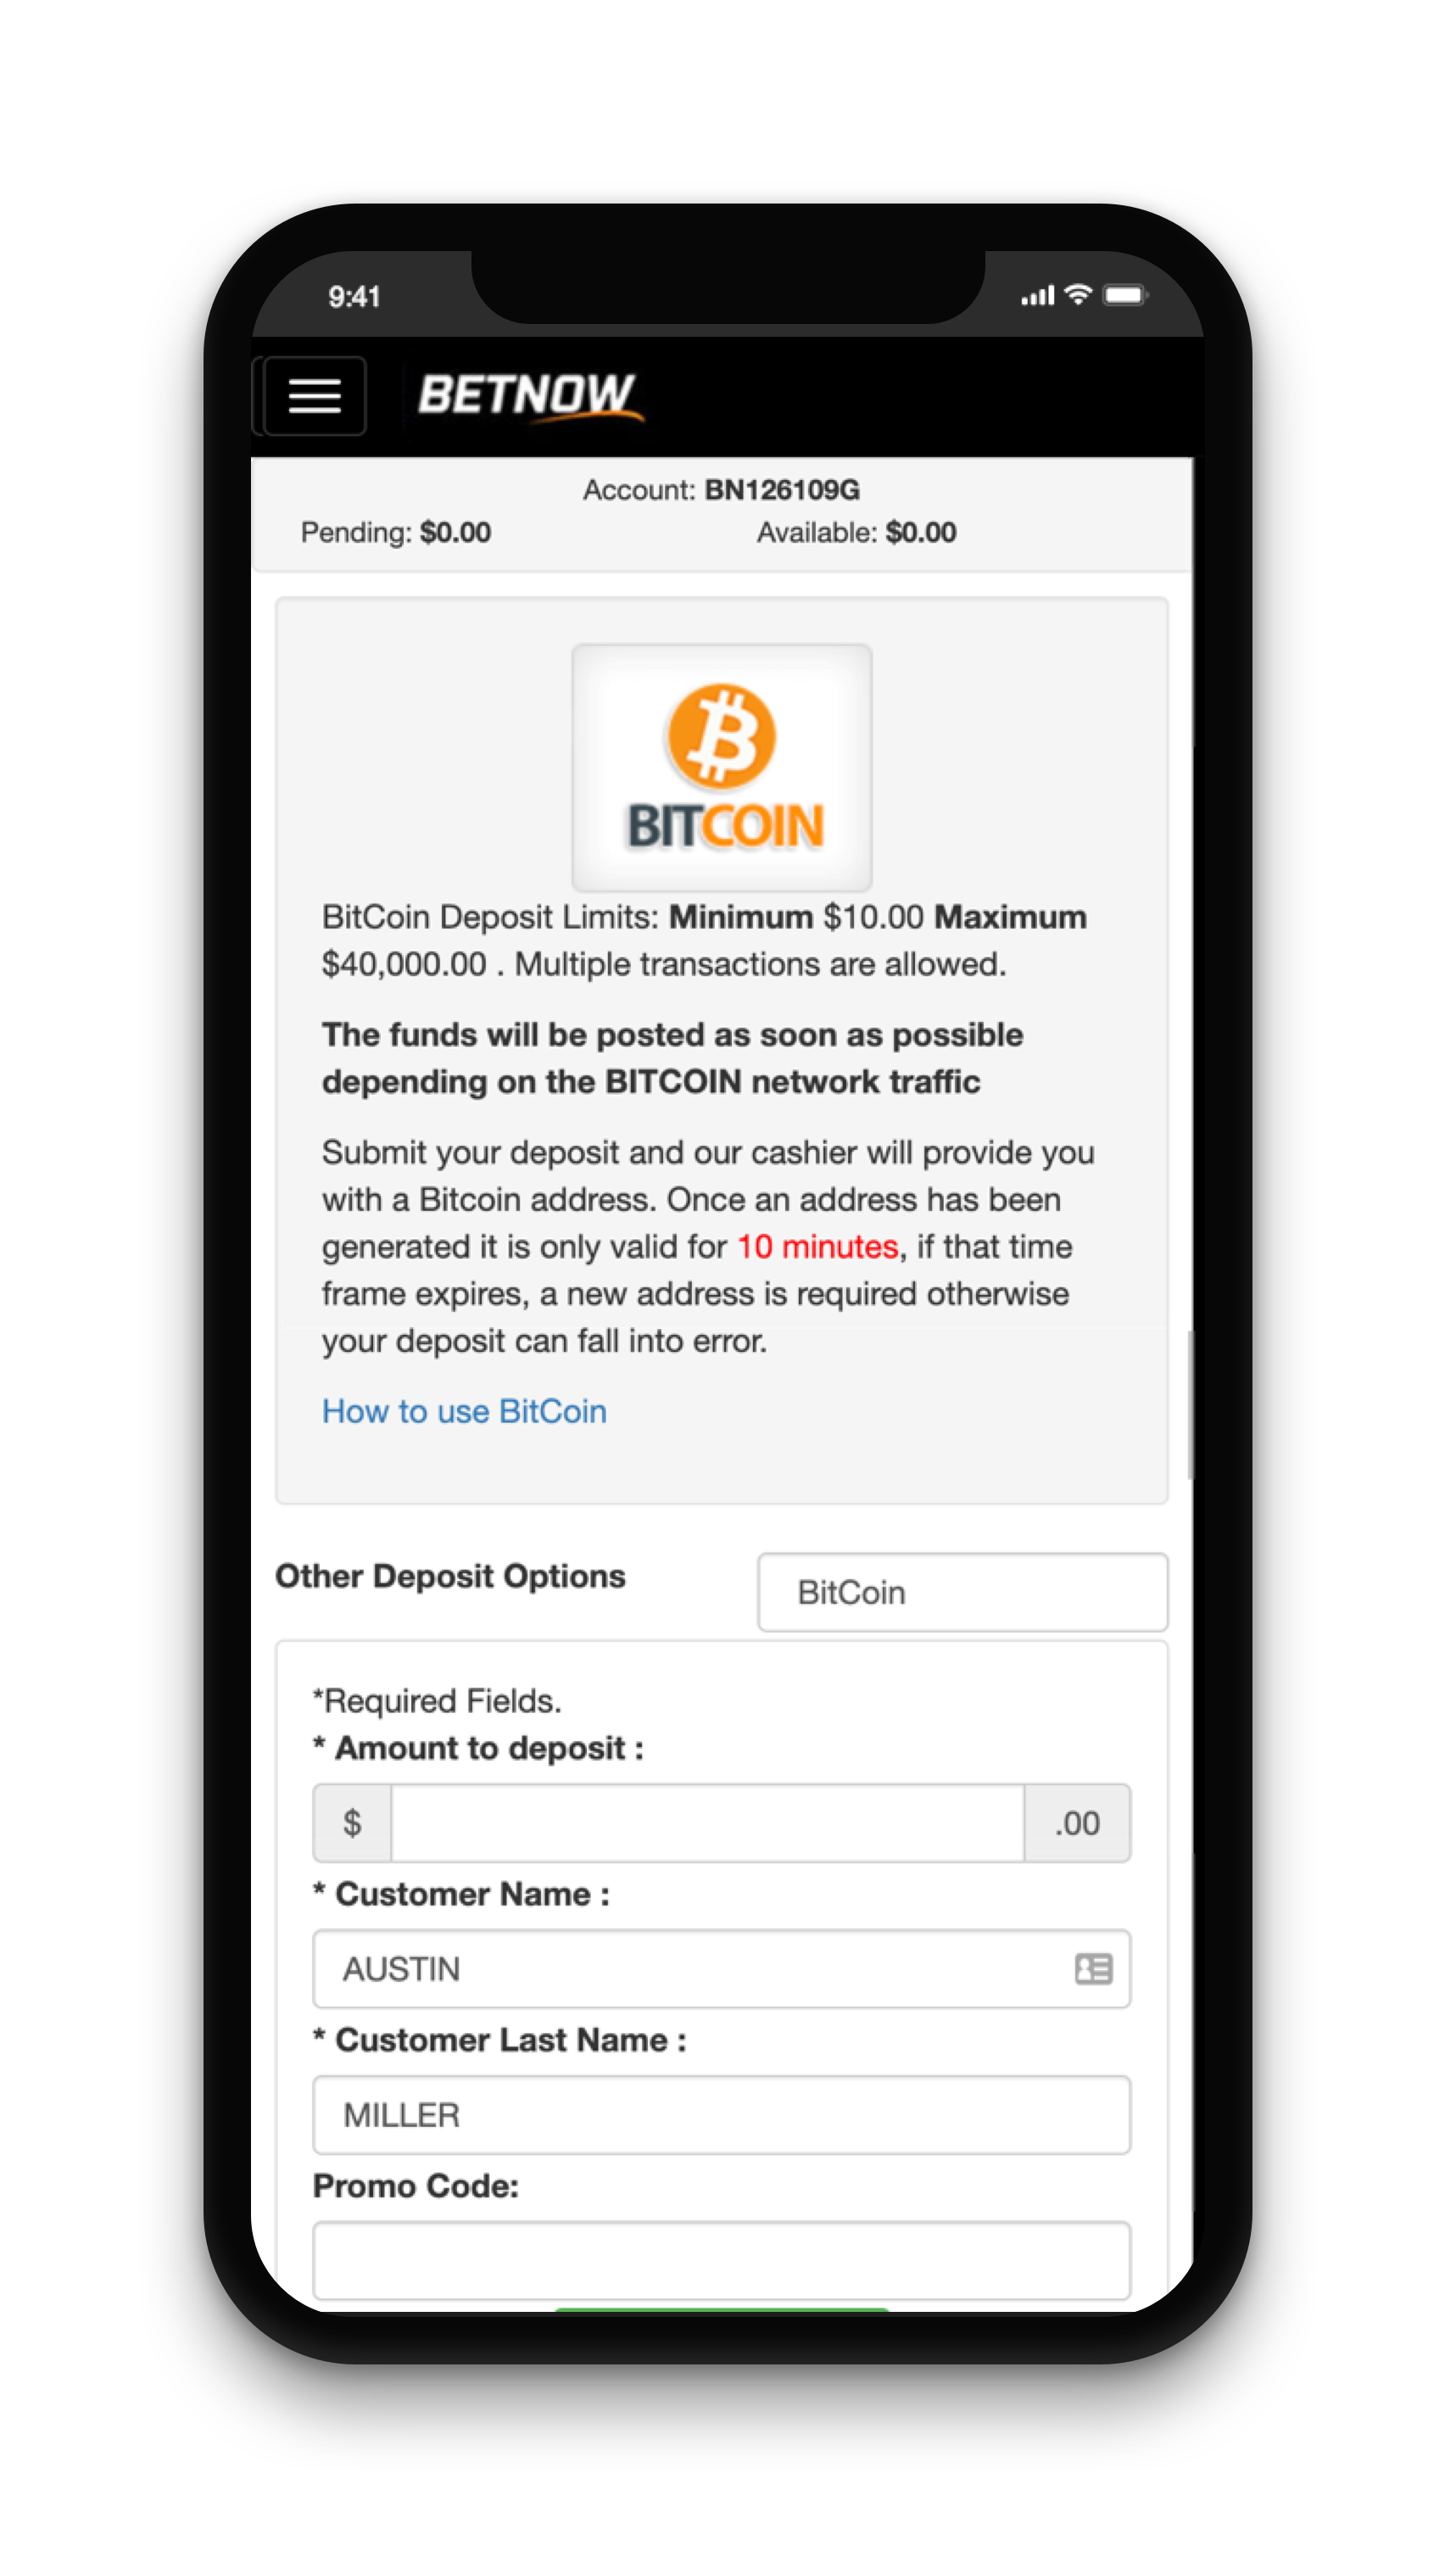 BetNow Deposit Screen